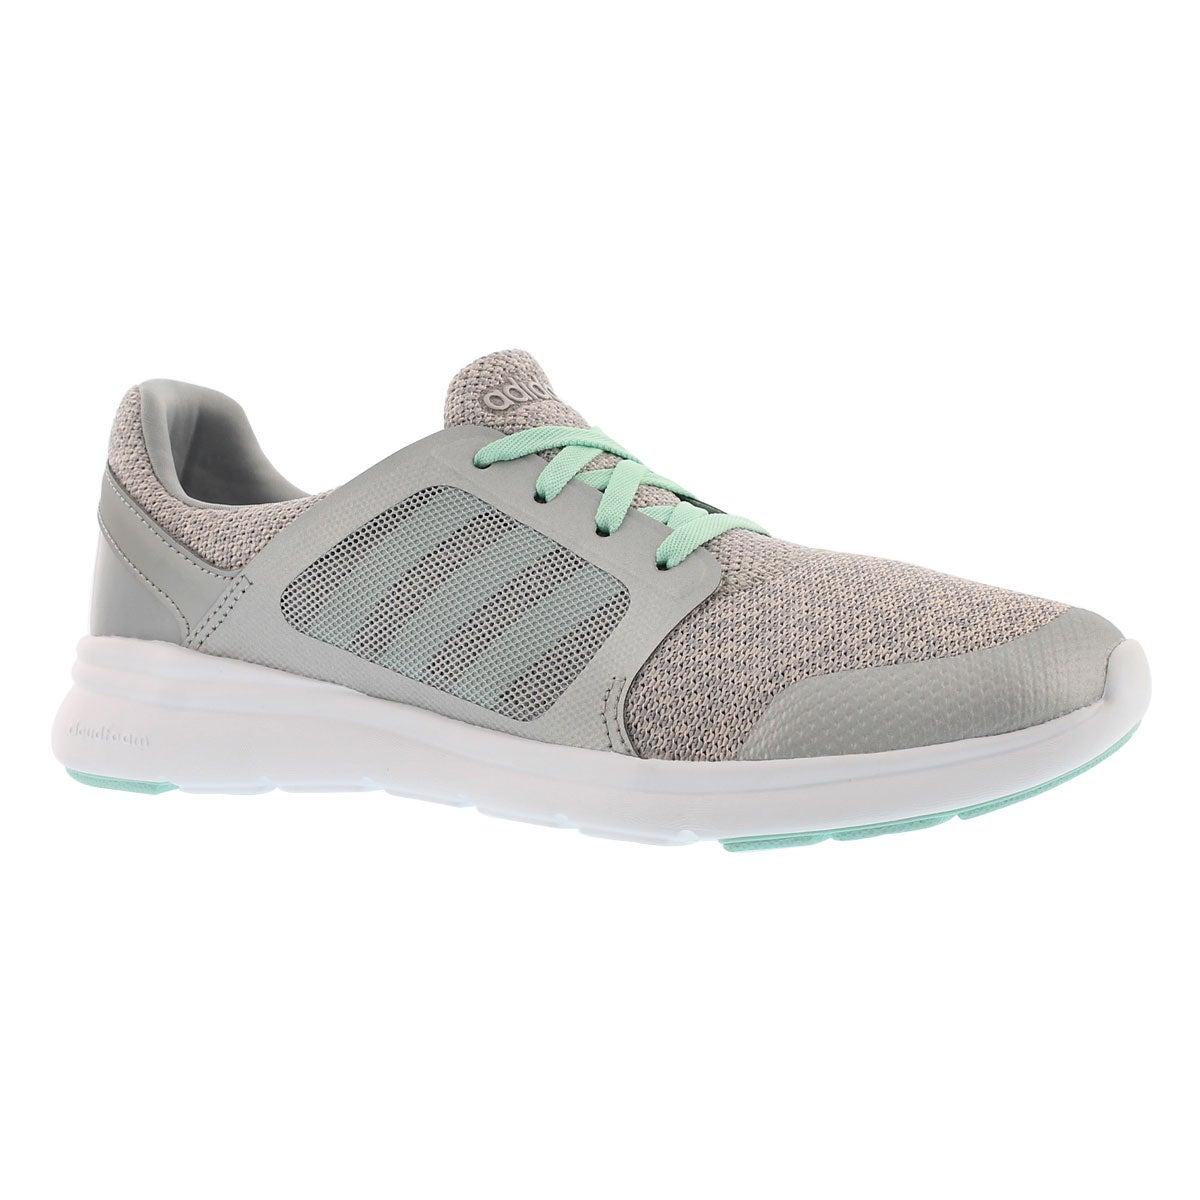 Lds Cloudfoam Xpression W grey sneaker